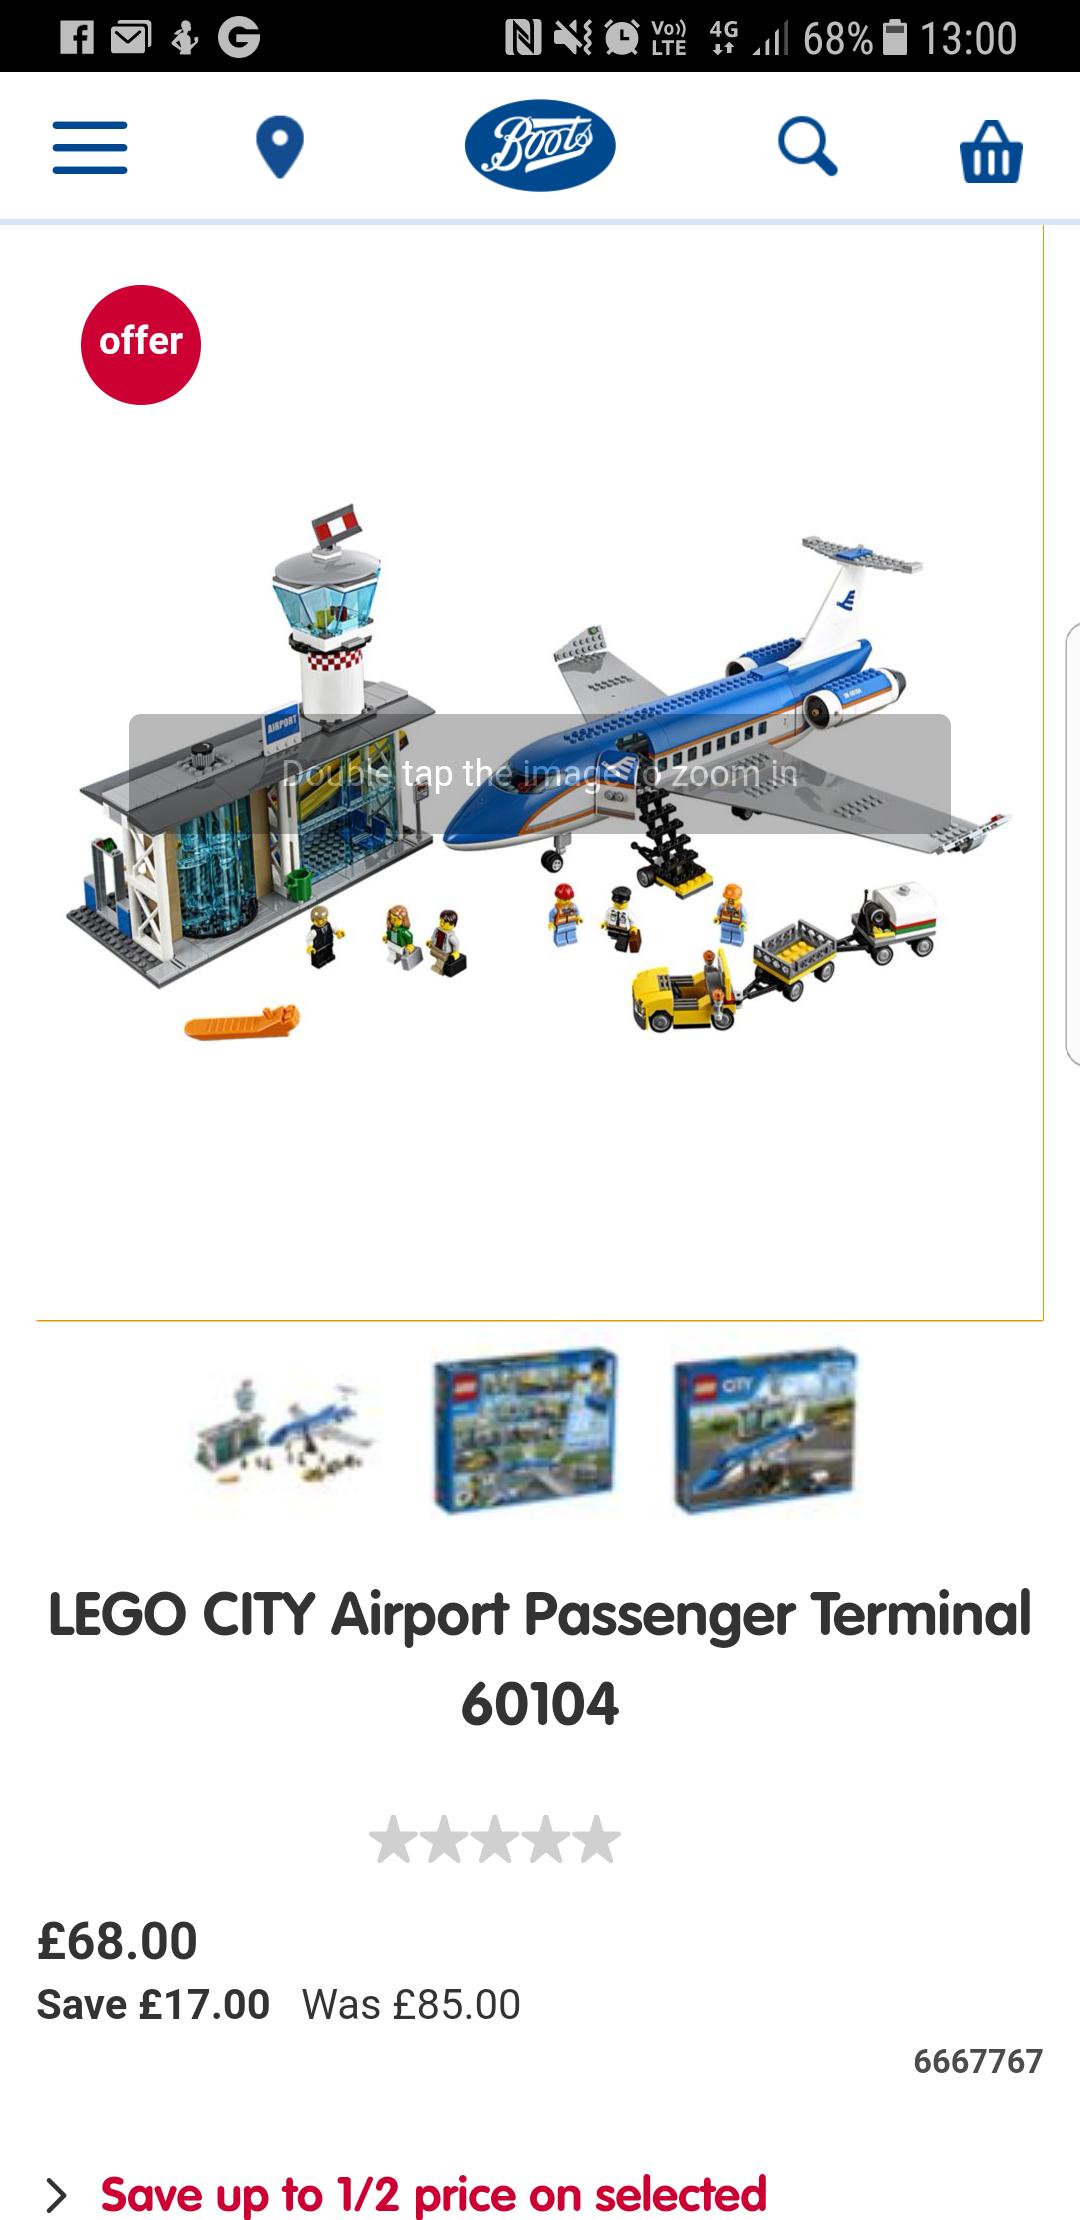 Lego City airport passenger terminal 60104 £68 @ Boots